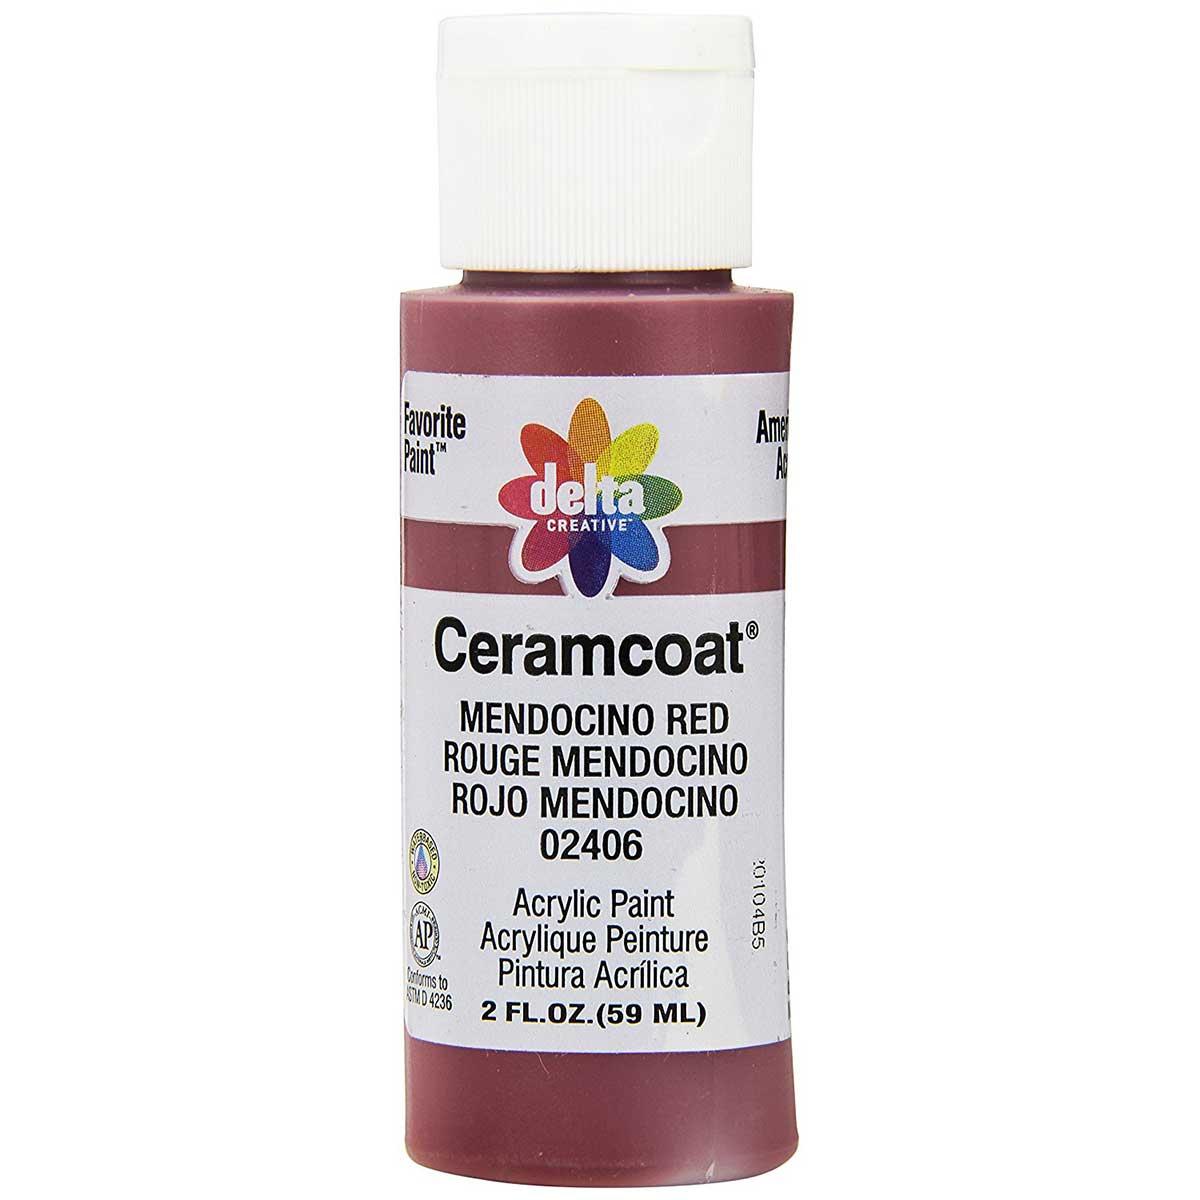 Delta Ceramcoat ® Acrylic Paint - Mendocino Red, 2 oz.